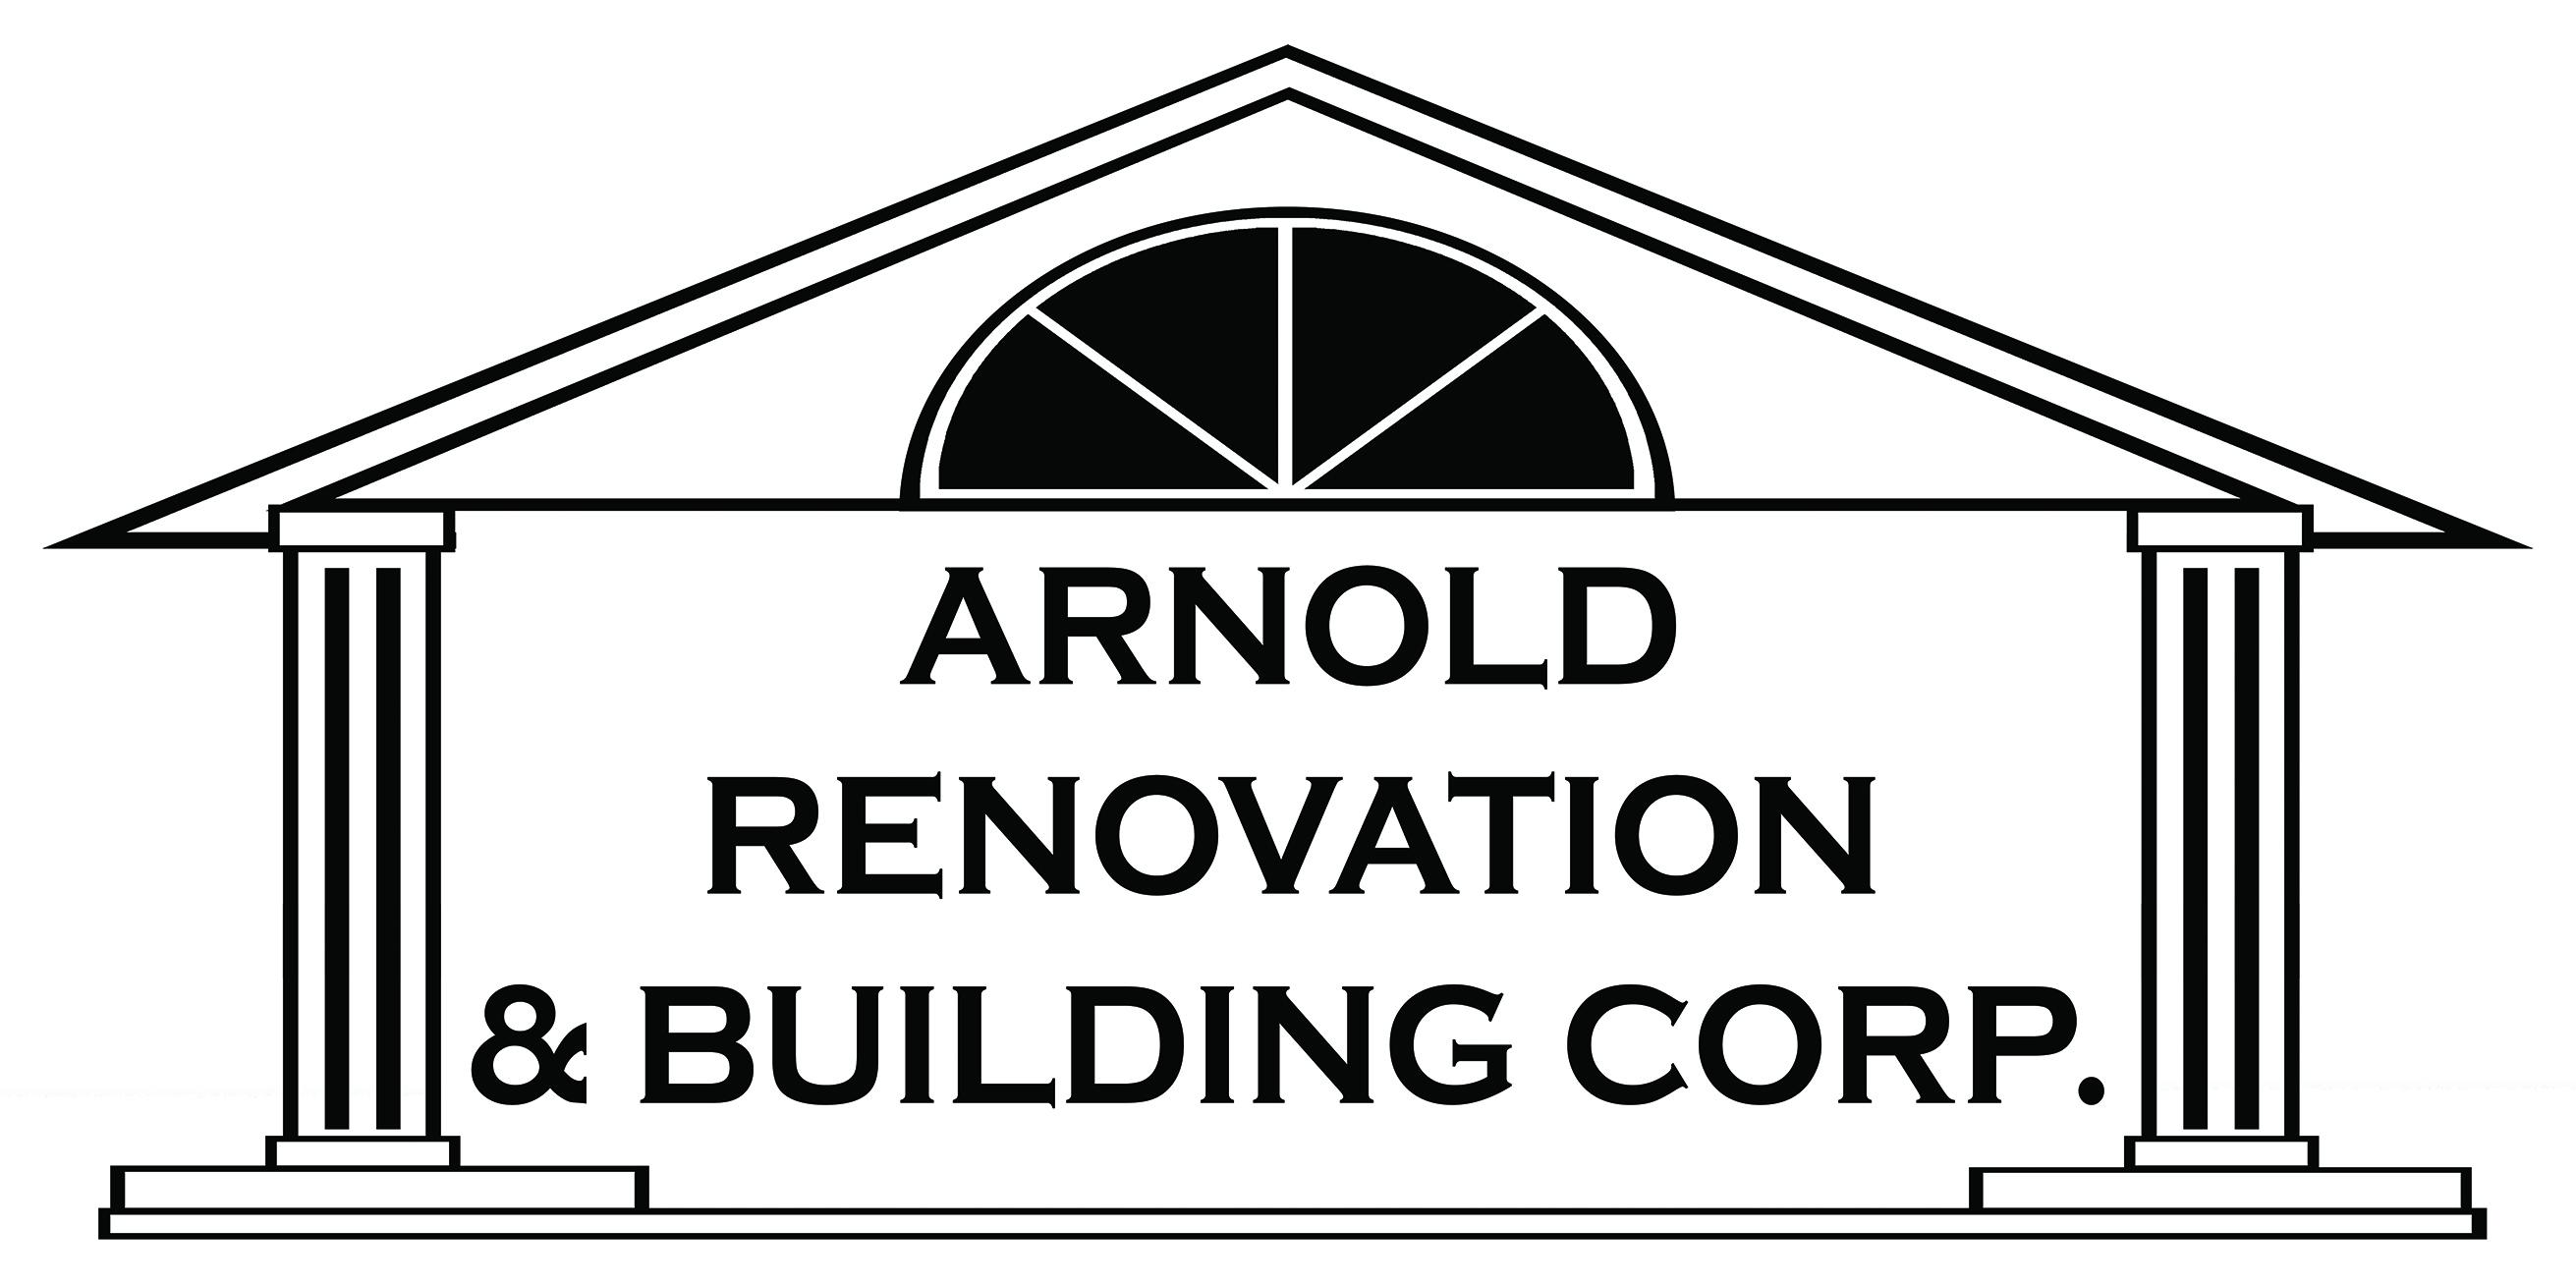 Arnold Renovation & Building Corp